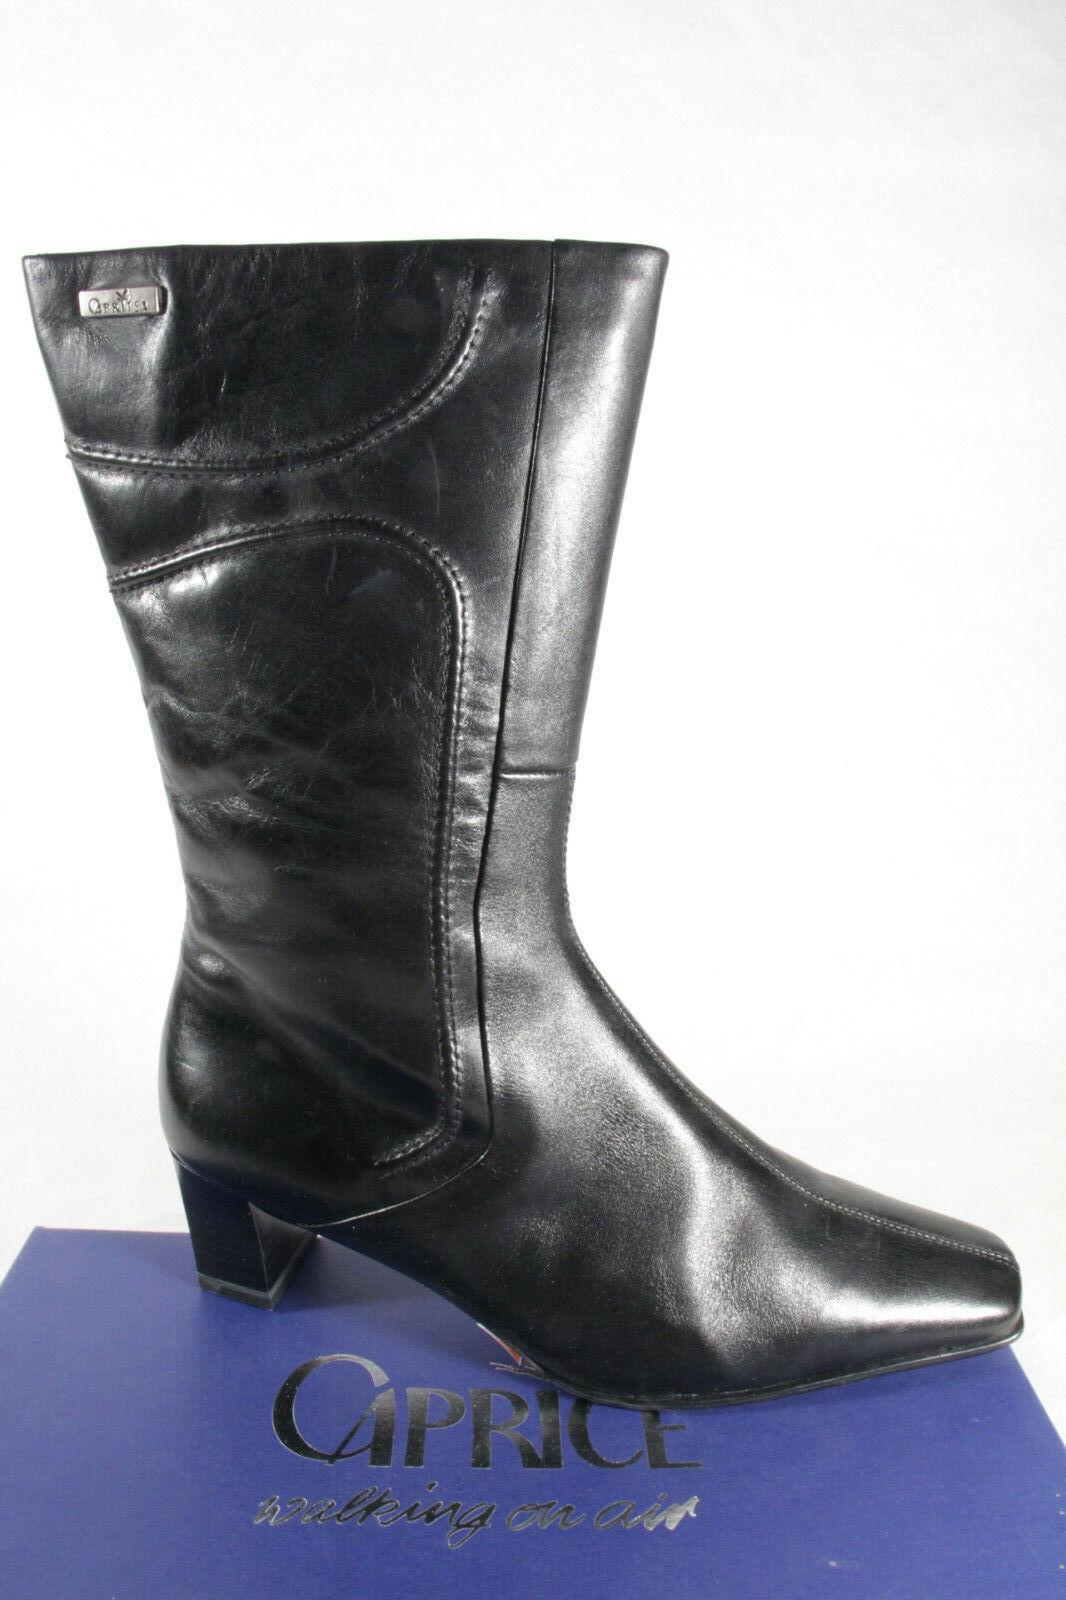 quality design 75a16 46e5d Caprice Damen Stiefel schwarz Echtleder Neu!!!